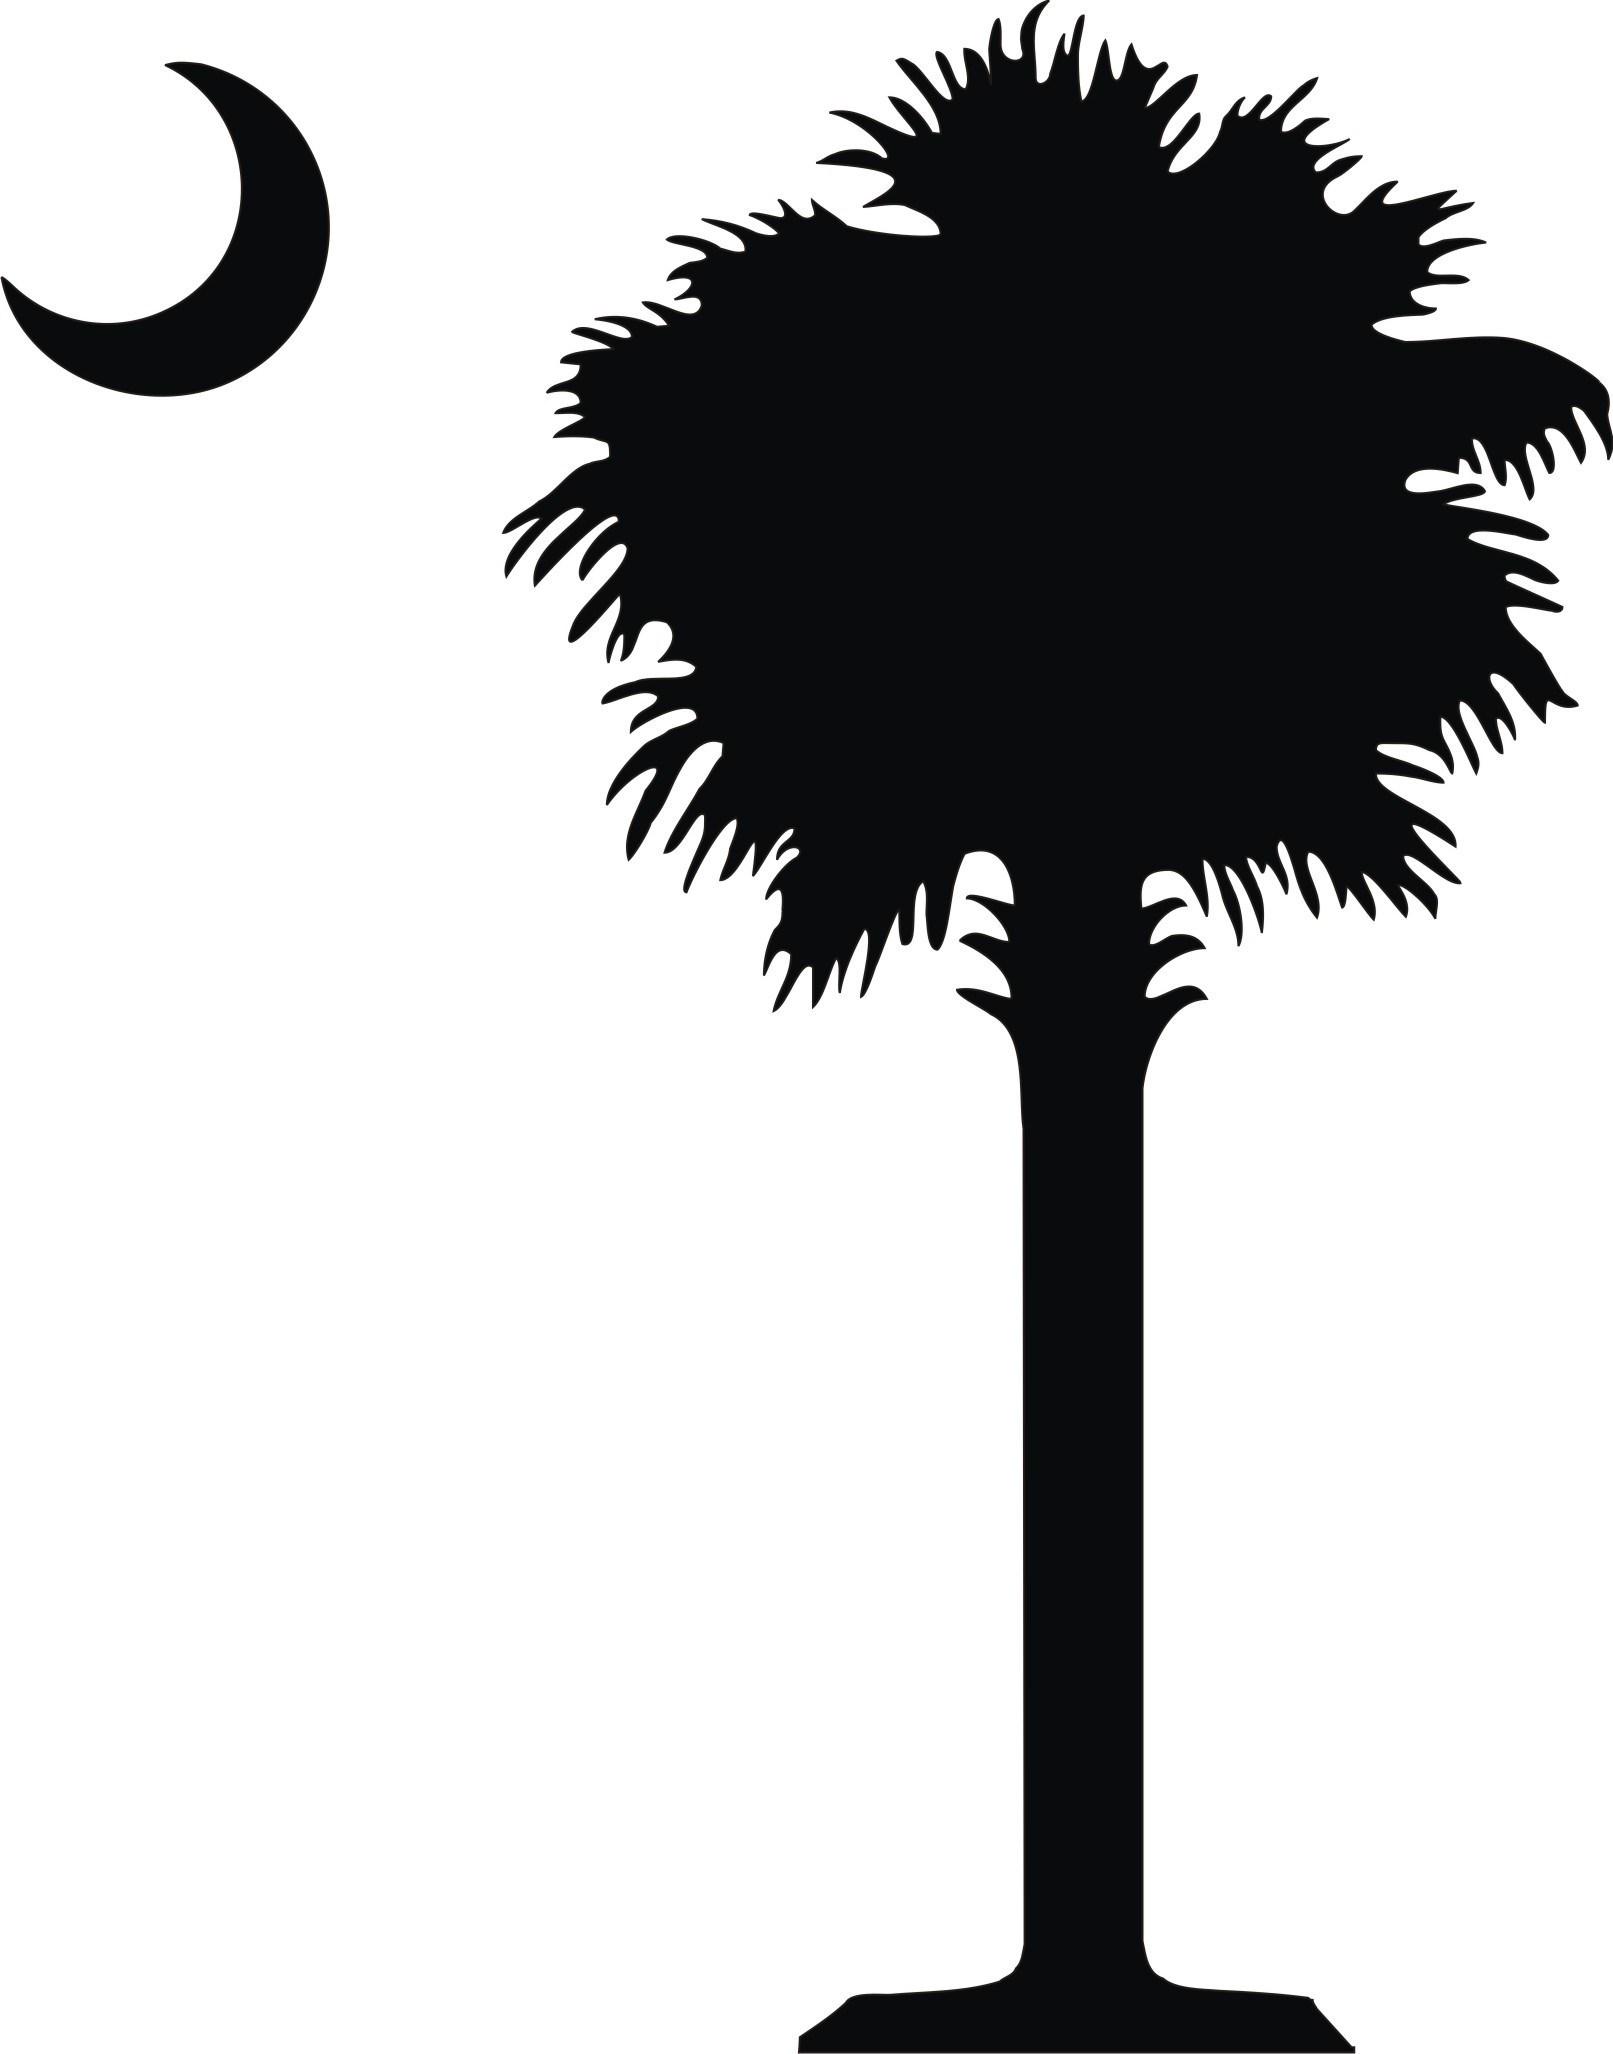 Palmeto clipart image free stock Palmetto tree clipart 1 » Clipart Portal image free stock